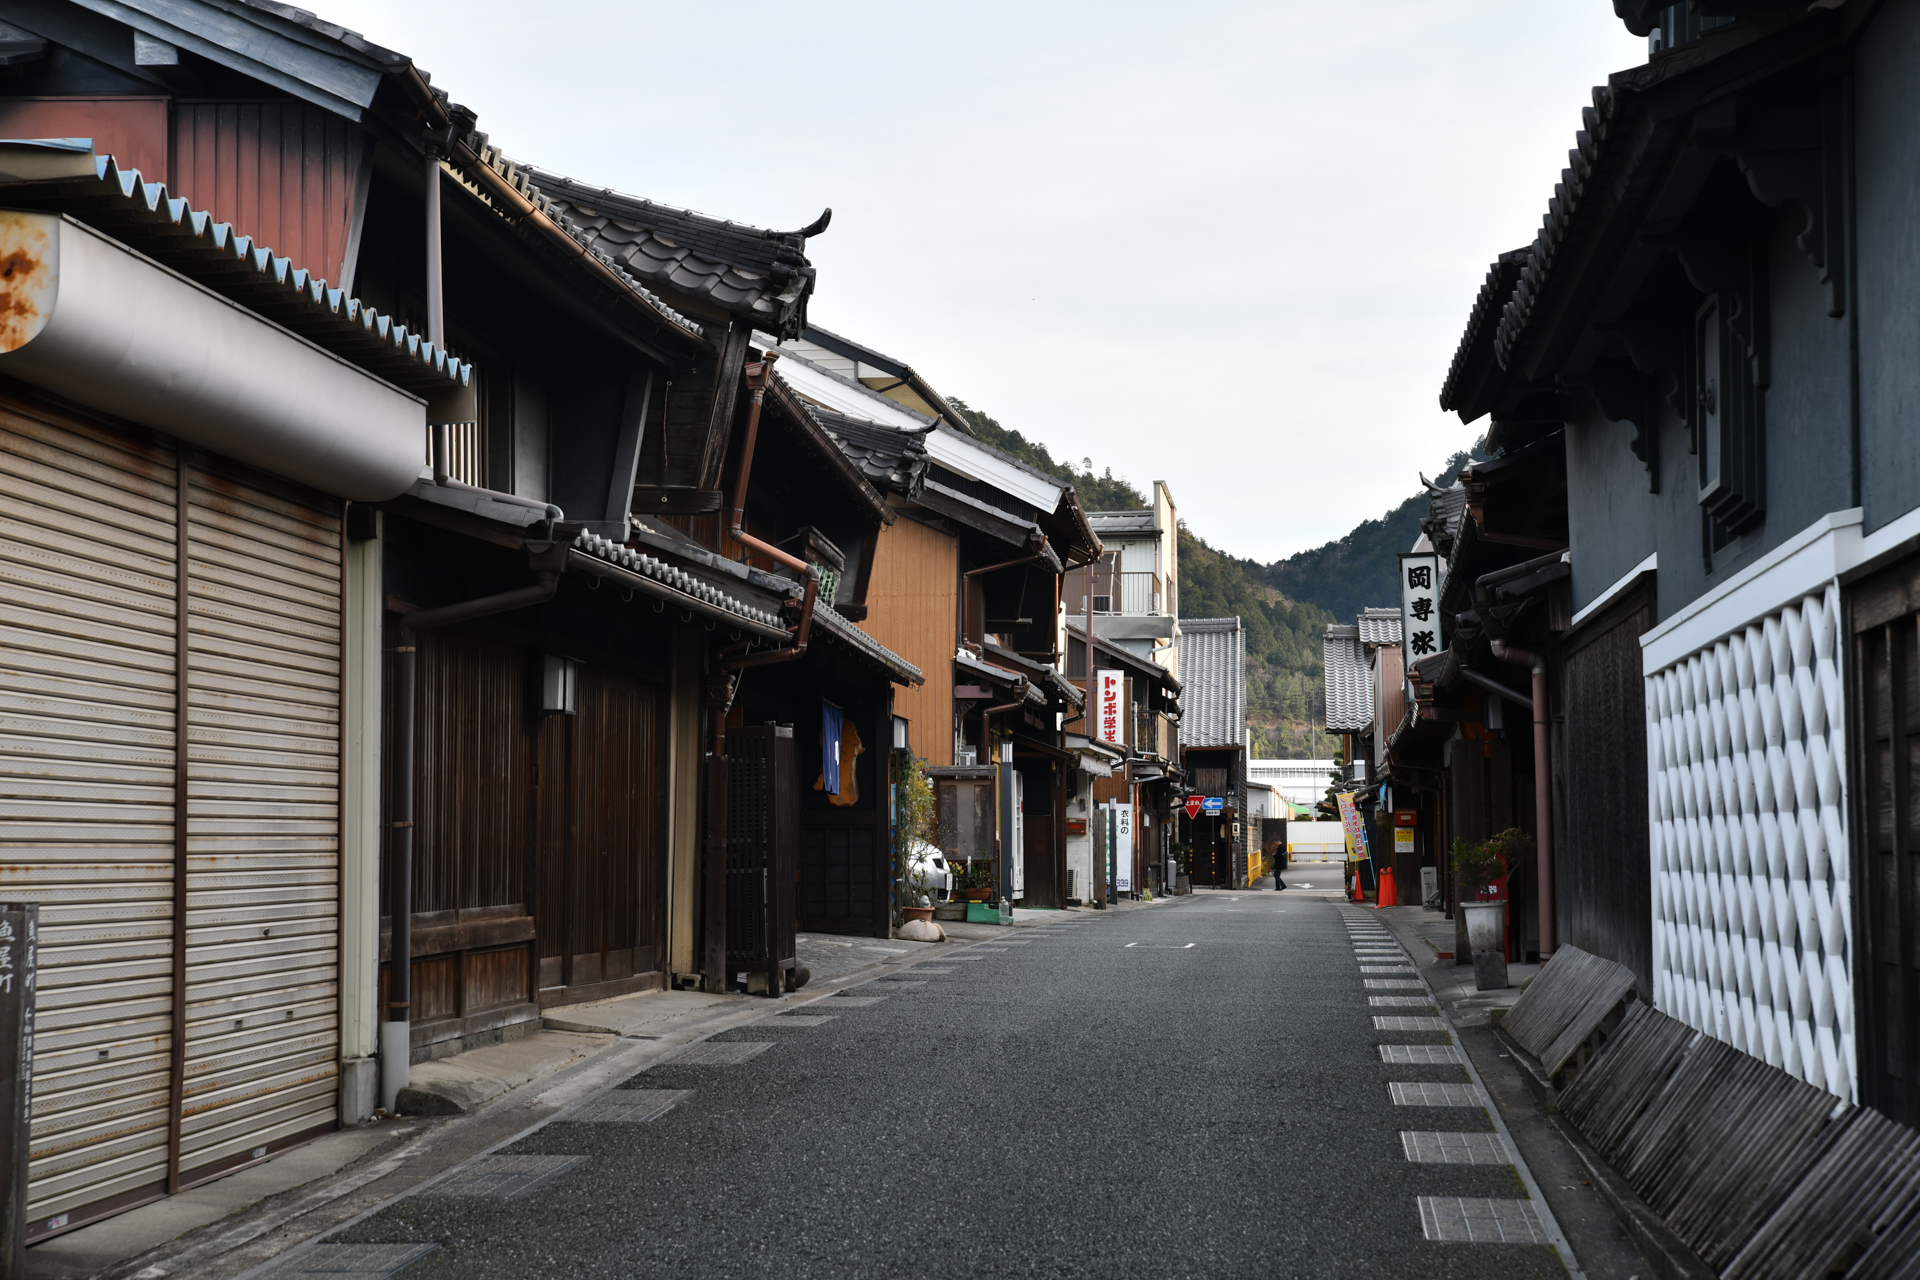 Nikon D850 SP 24-70mm F/2.8 Di VC USD G2 重要伝統的建造物群保存地区 うだつの上がる町並み